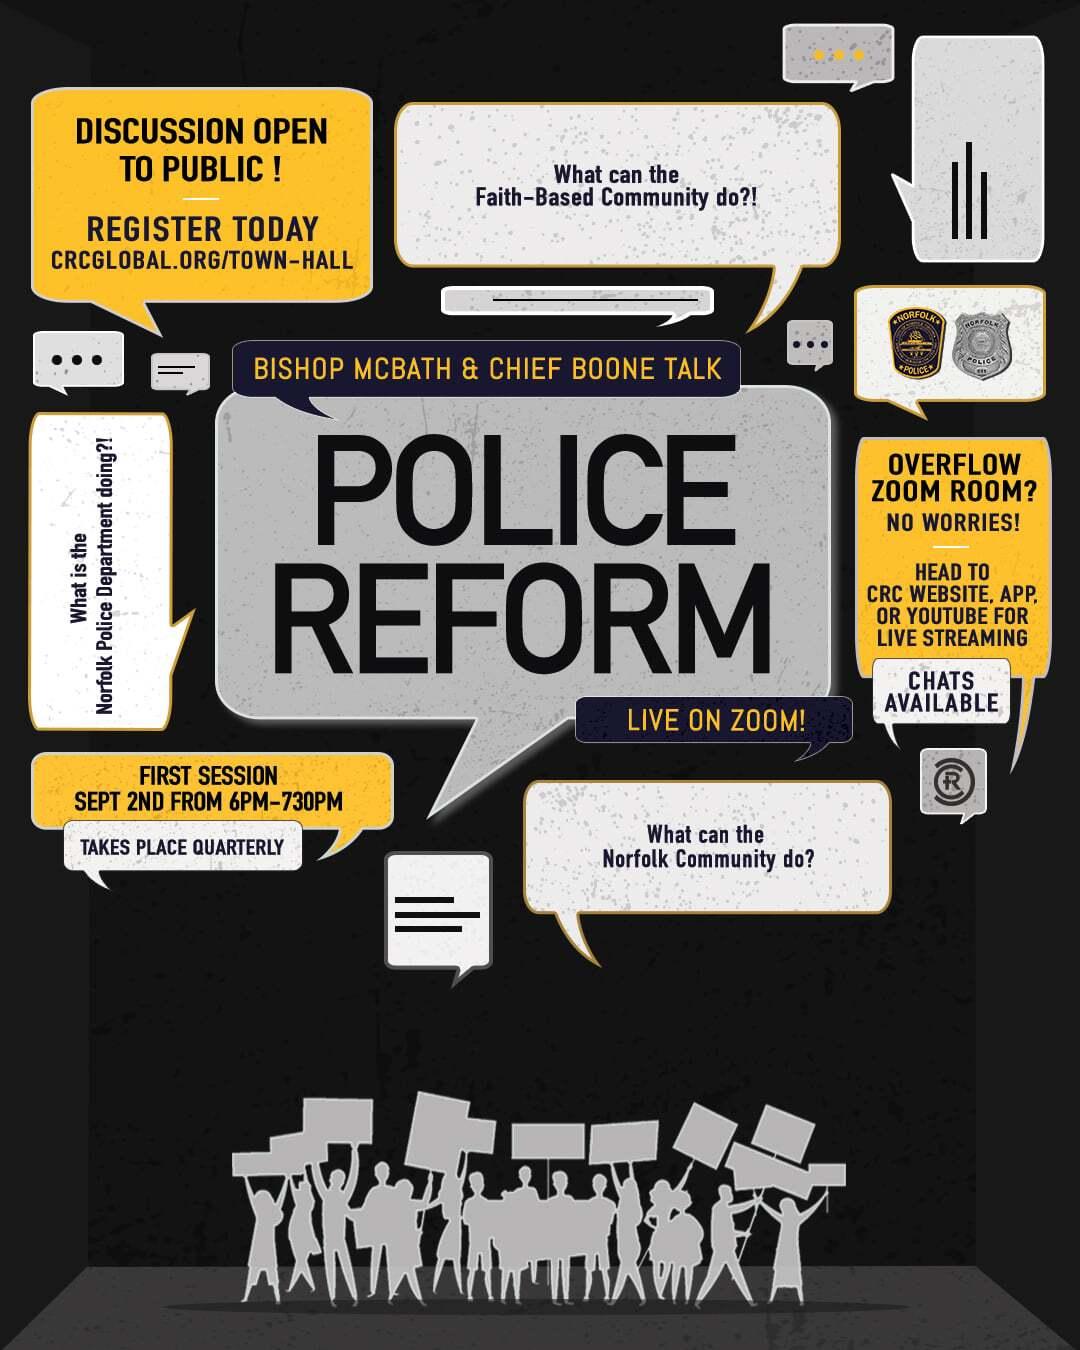 NPD policing reform virtual town hall meeting (September 2).jpg